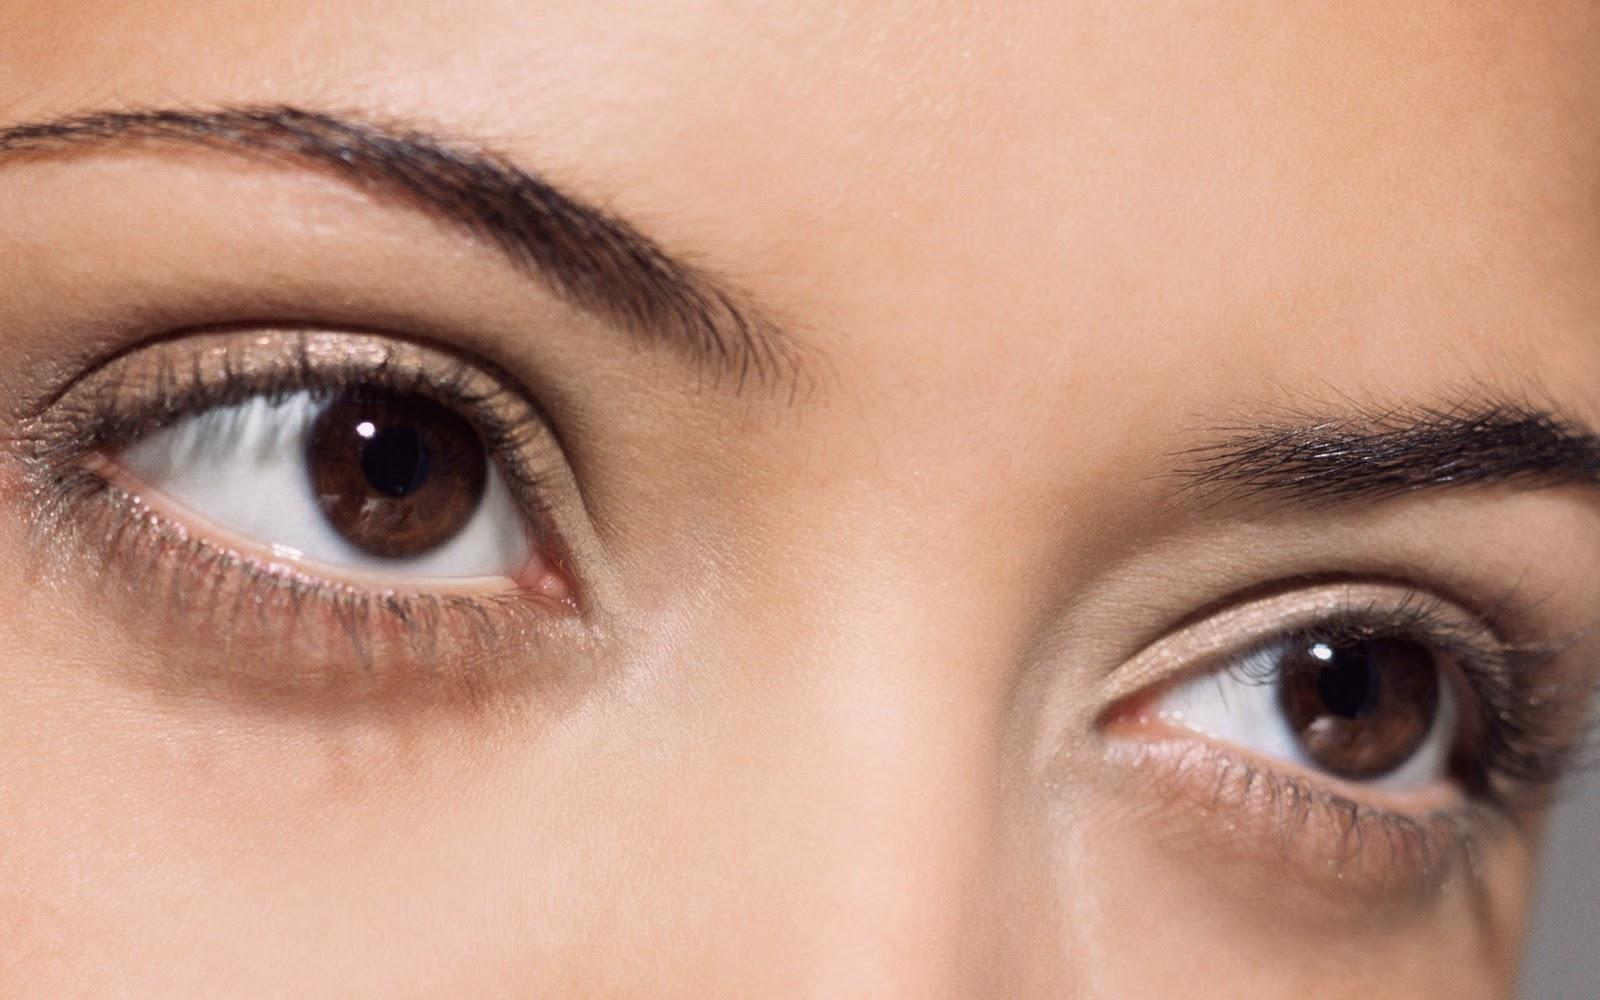 Will yoga improve eyesight? 6